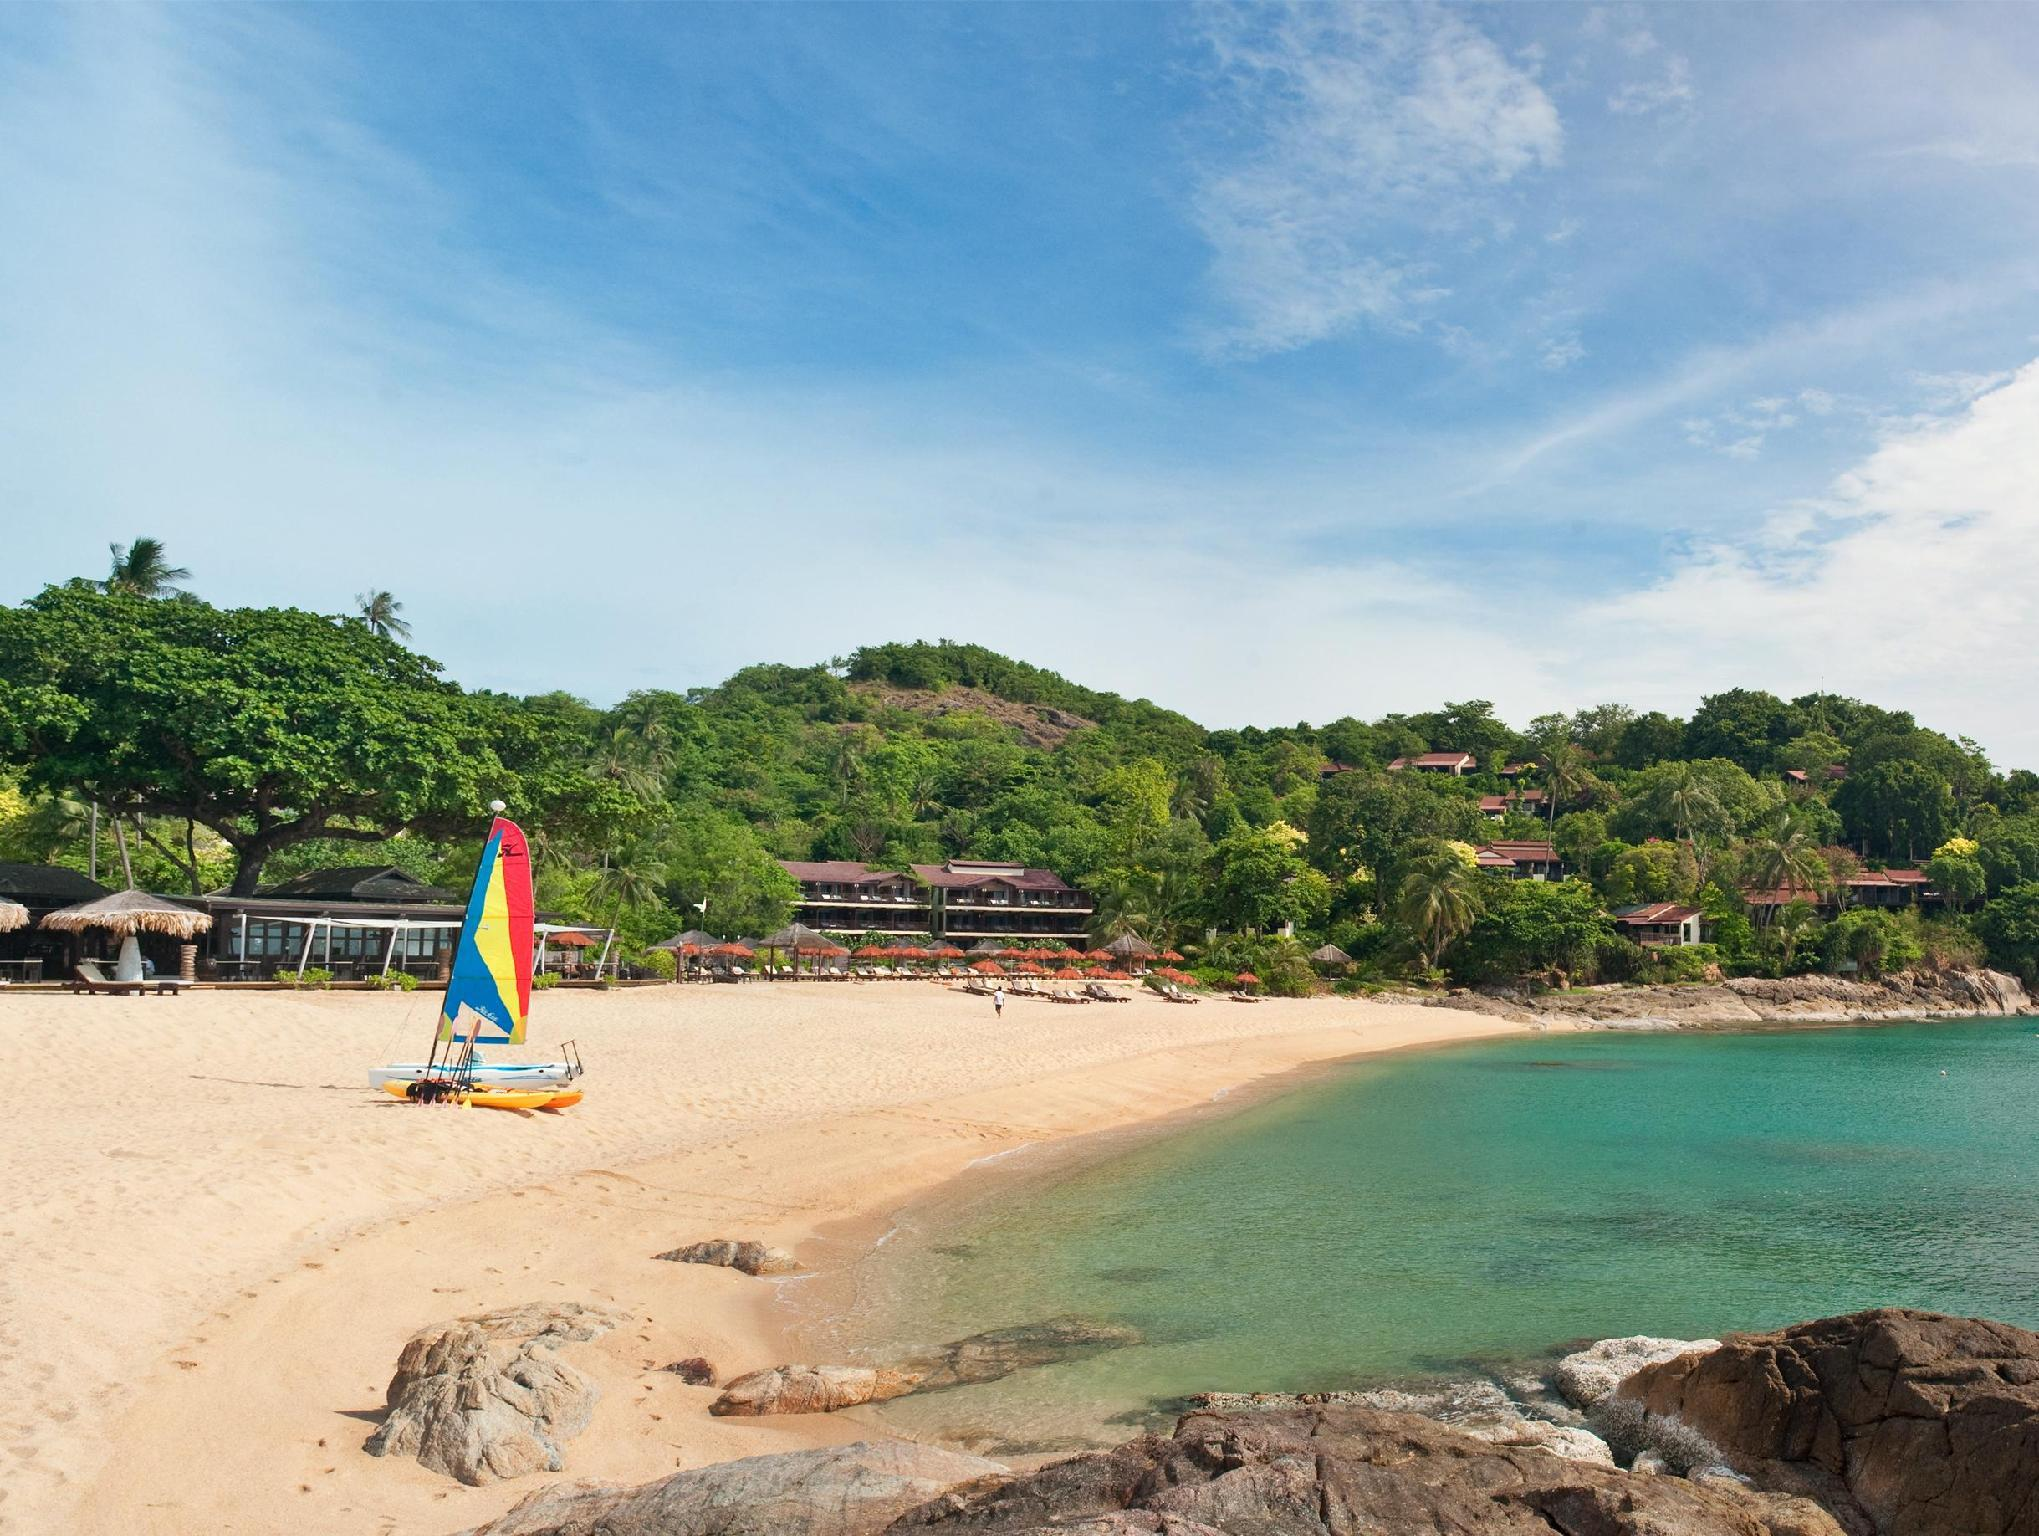 The Tongsai Bay Hotel โรงแรมบ้านท้องทราย